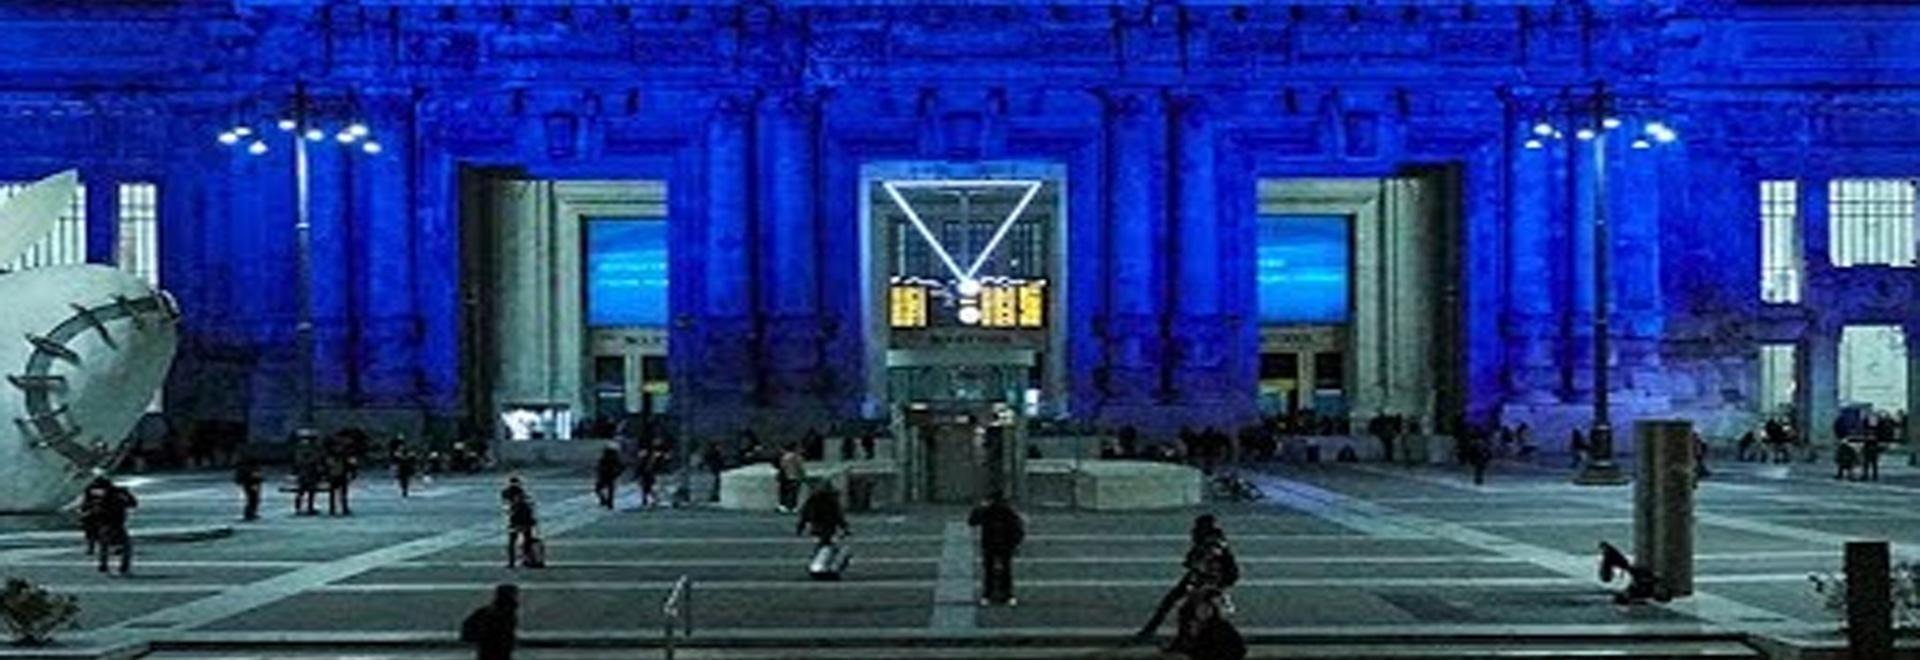 Ermenegildo Zegna à la Gare Centrale de Milan